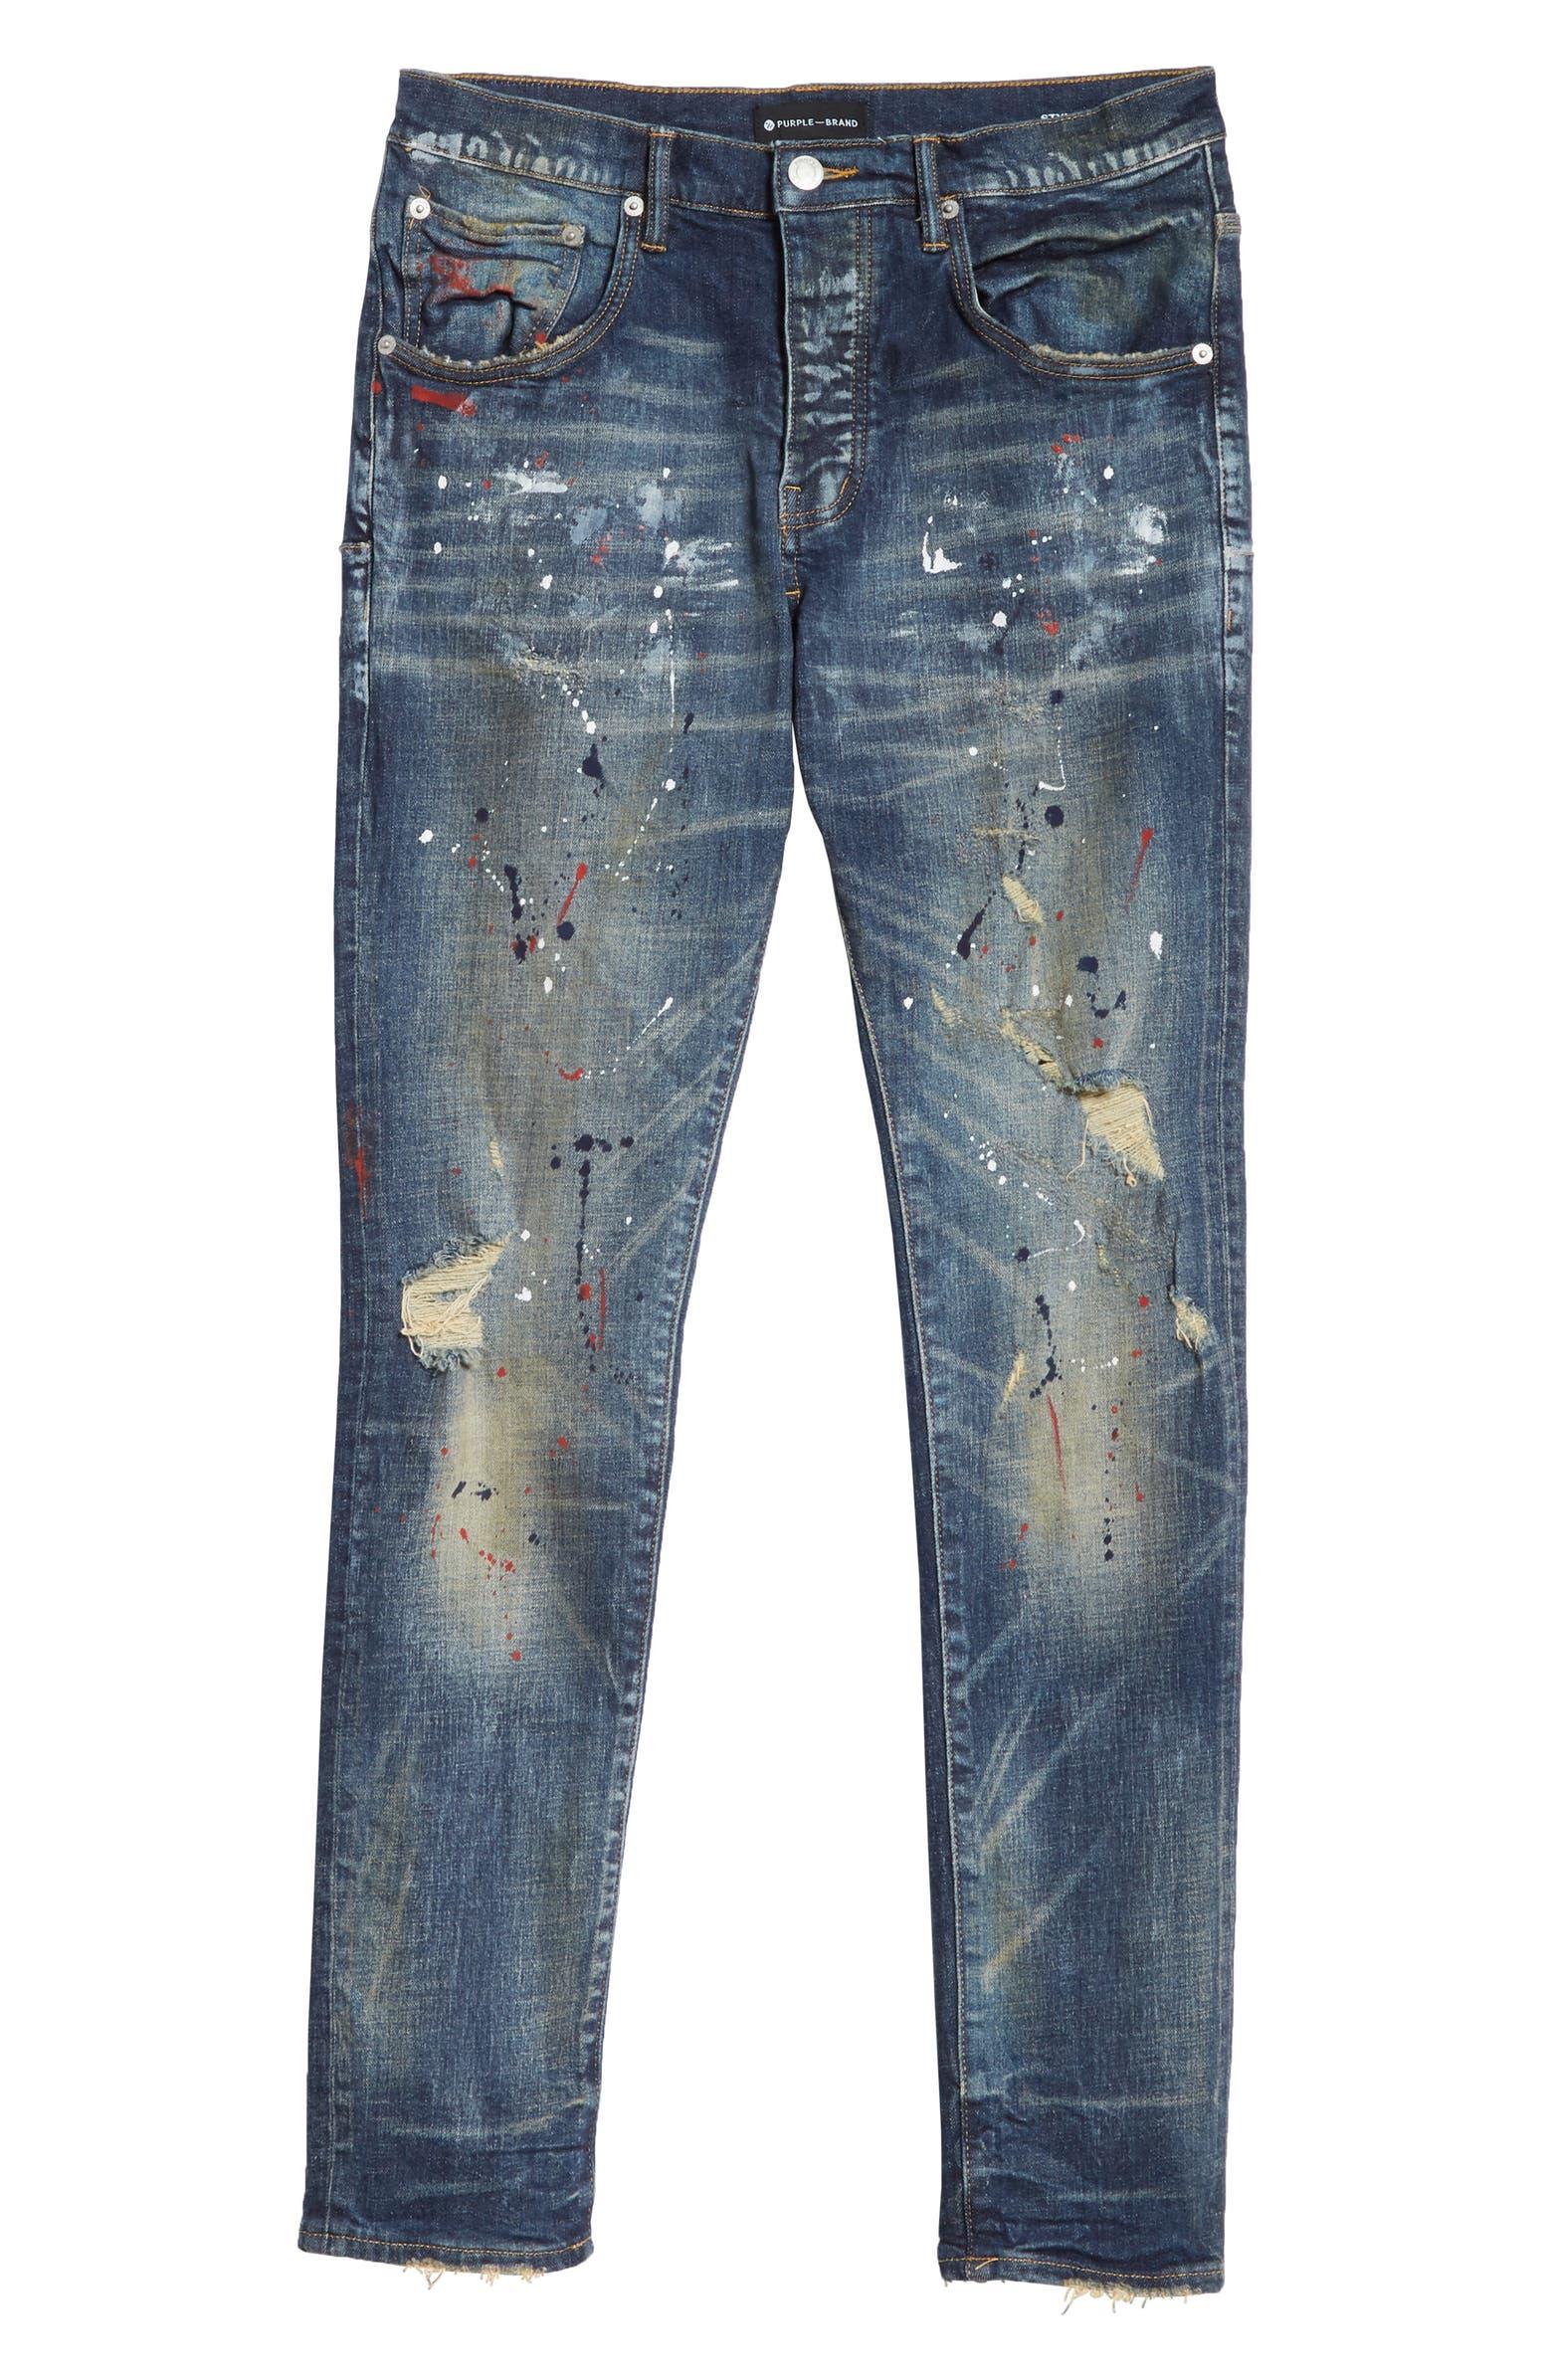 Dirty Distress Paint Spatter Jeans PURPLE